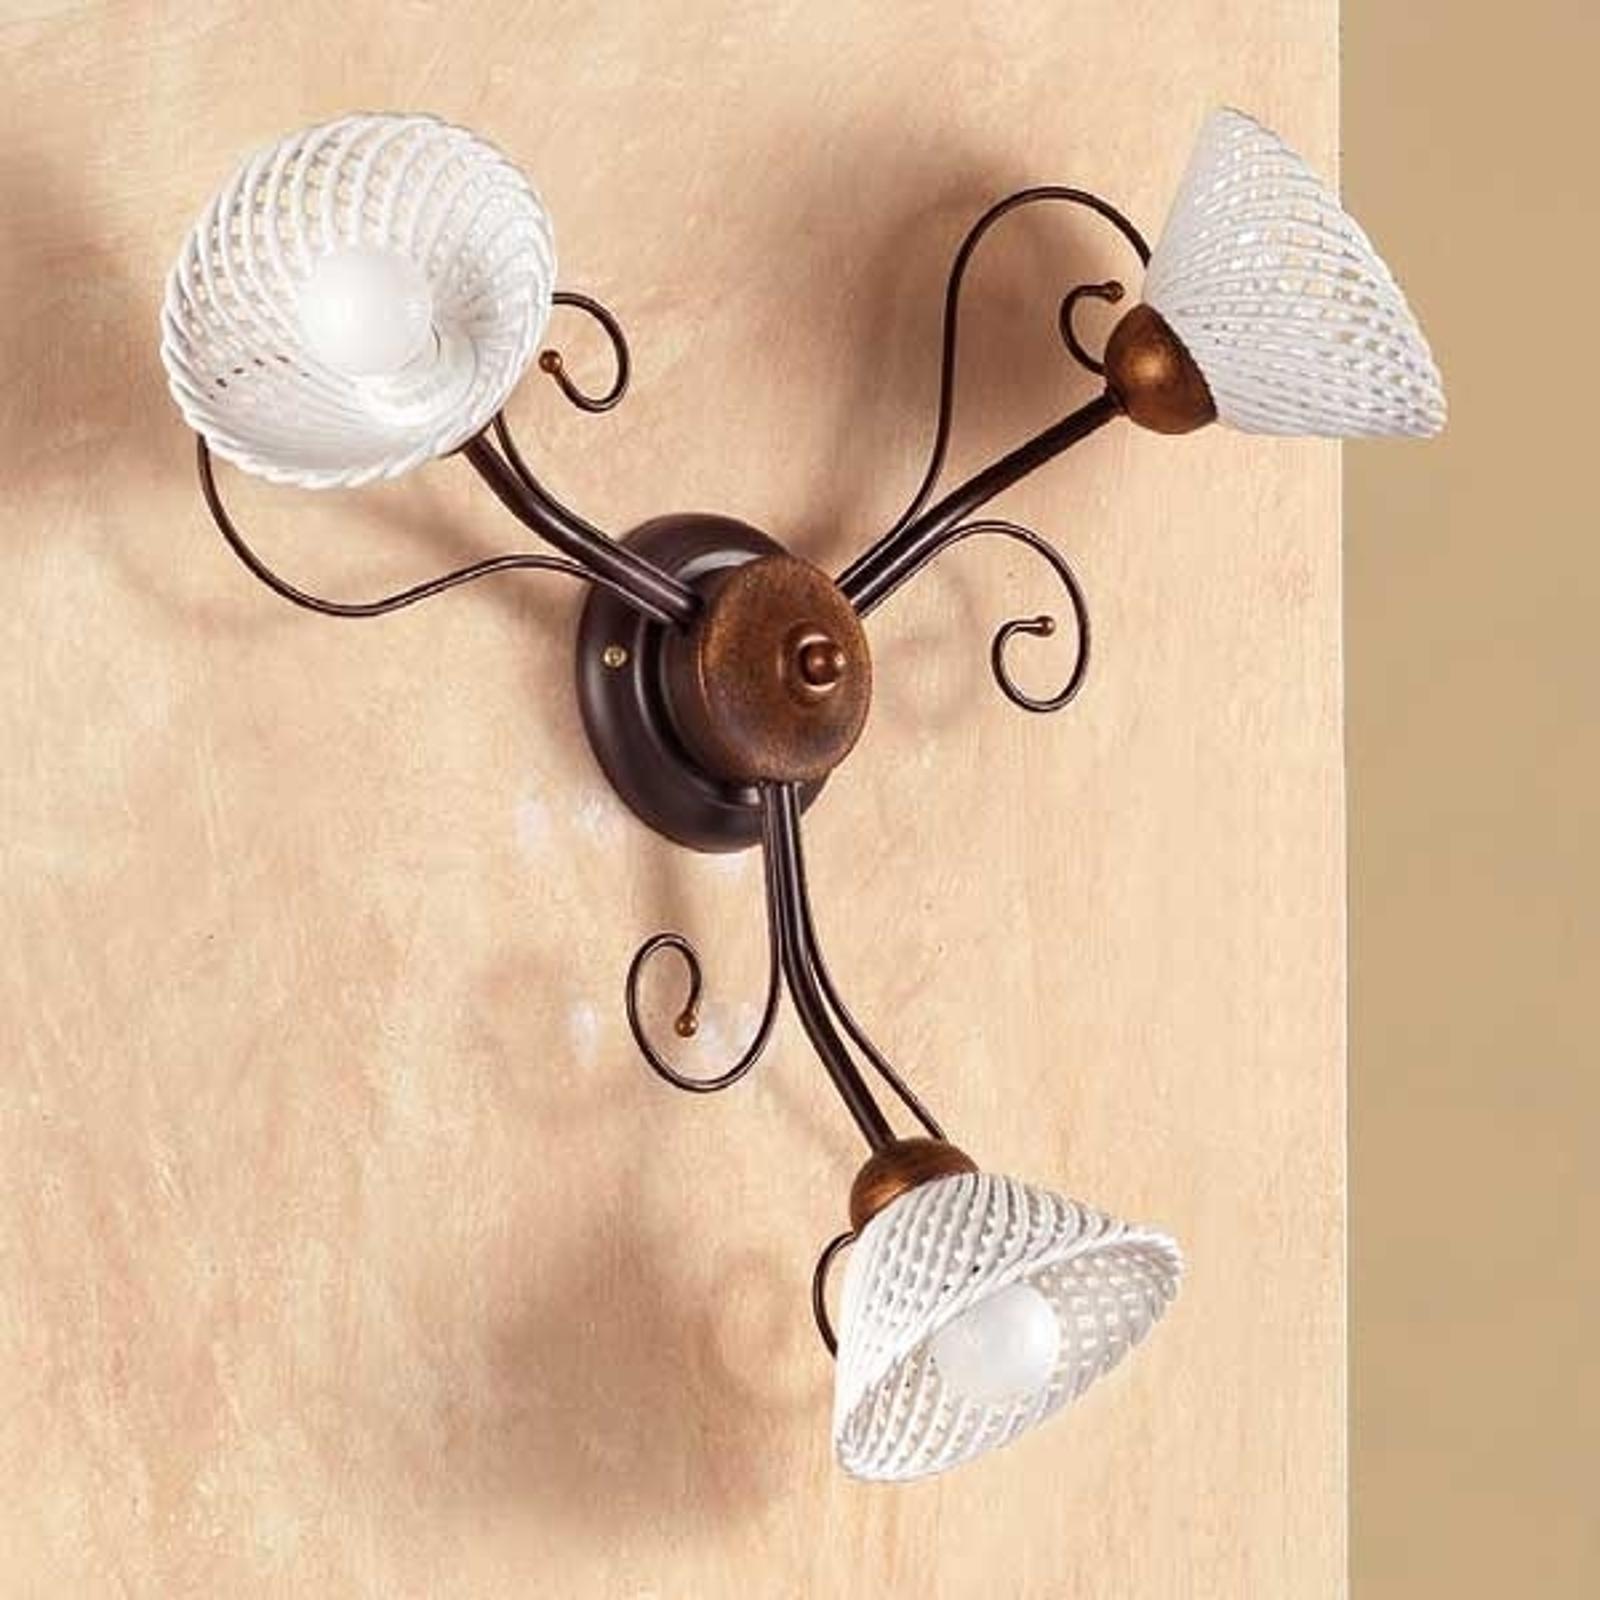 Stilfull RETINA taklampe med tre lys